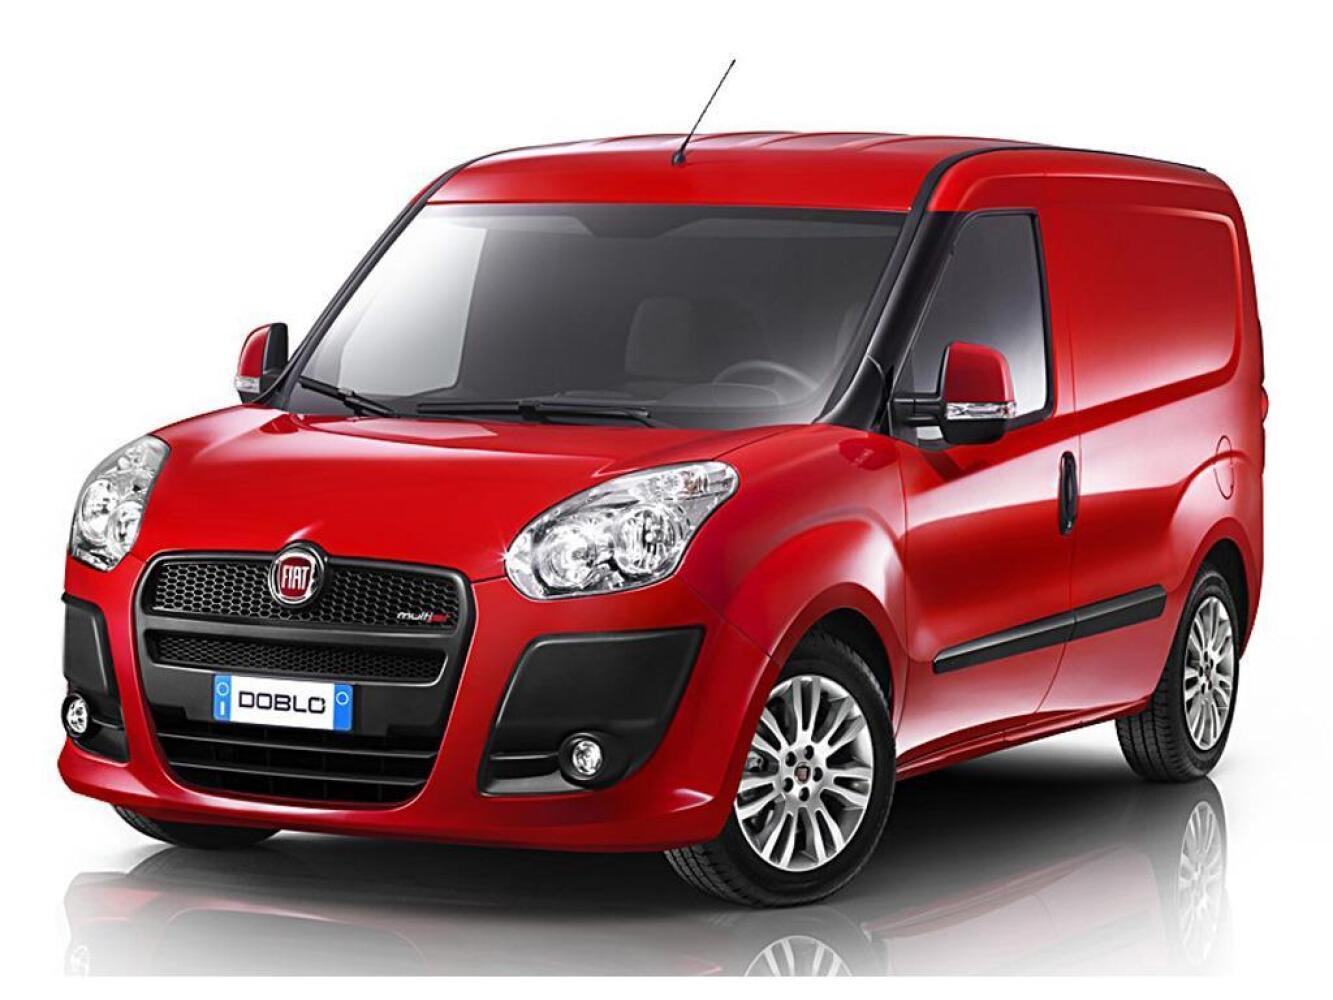 New Fiat Doblo Cargo Maxi Lwb Diesel 1 6 Multijet 16v 90 Van